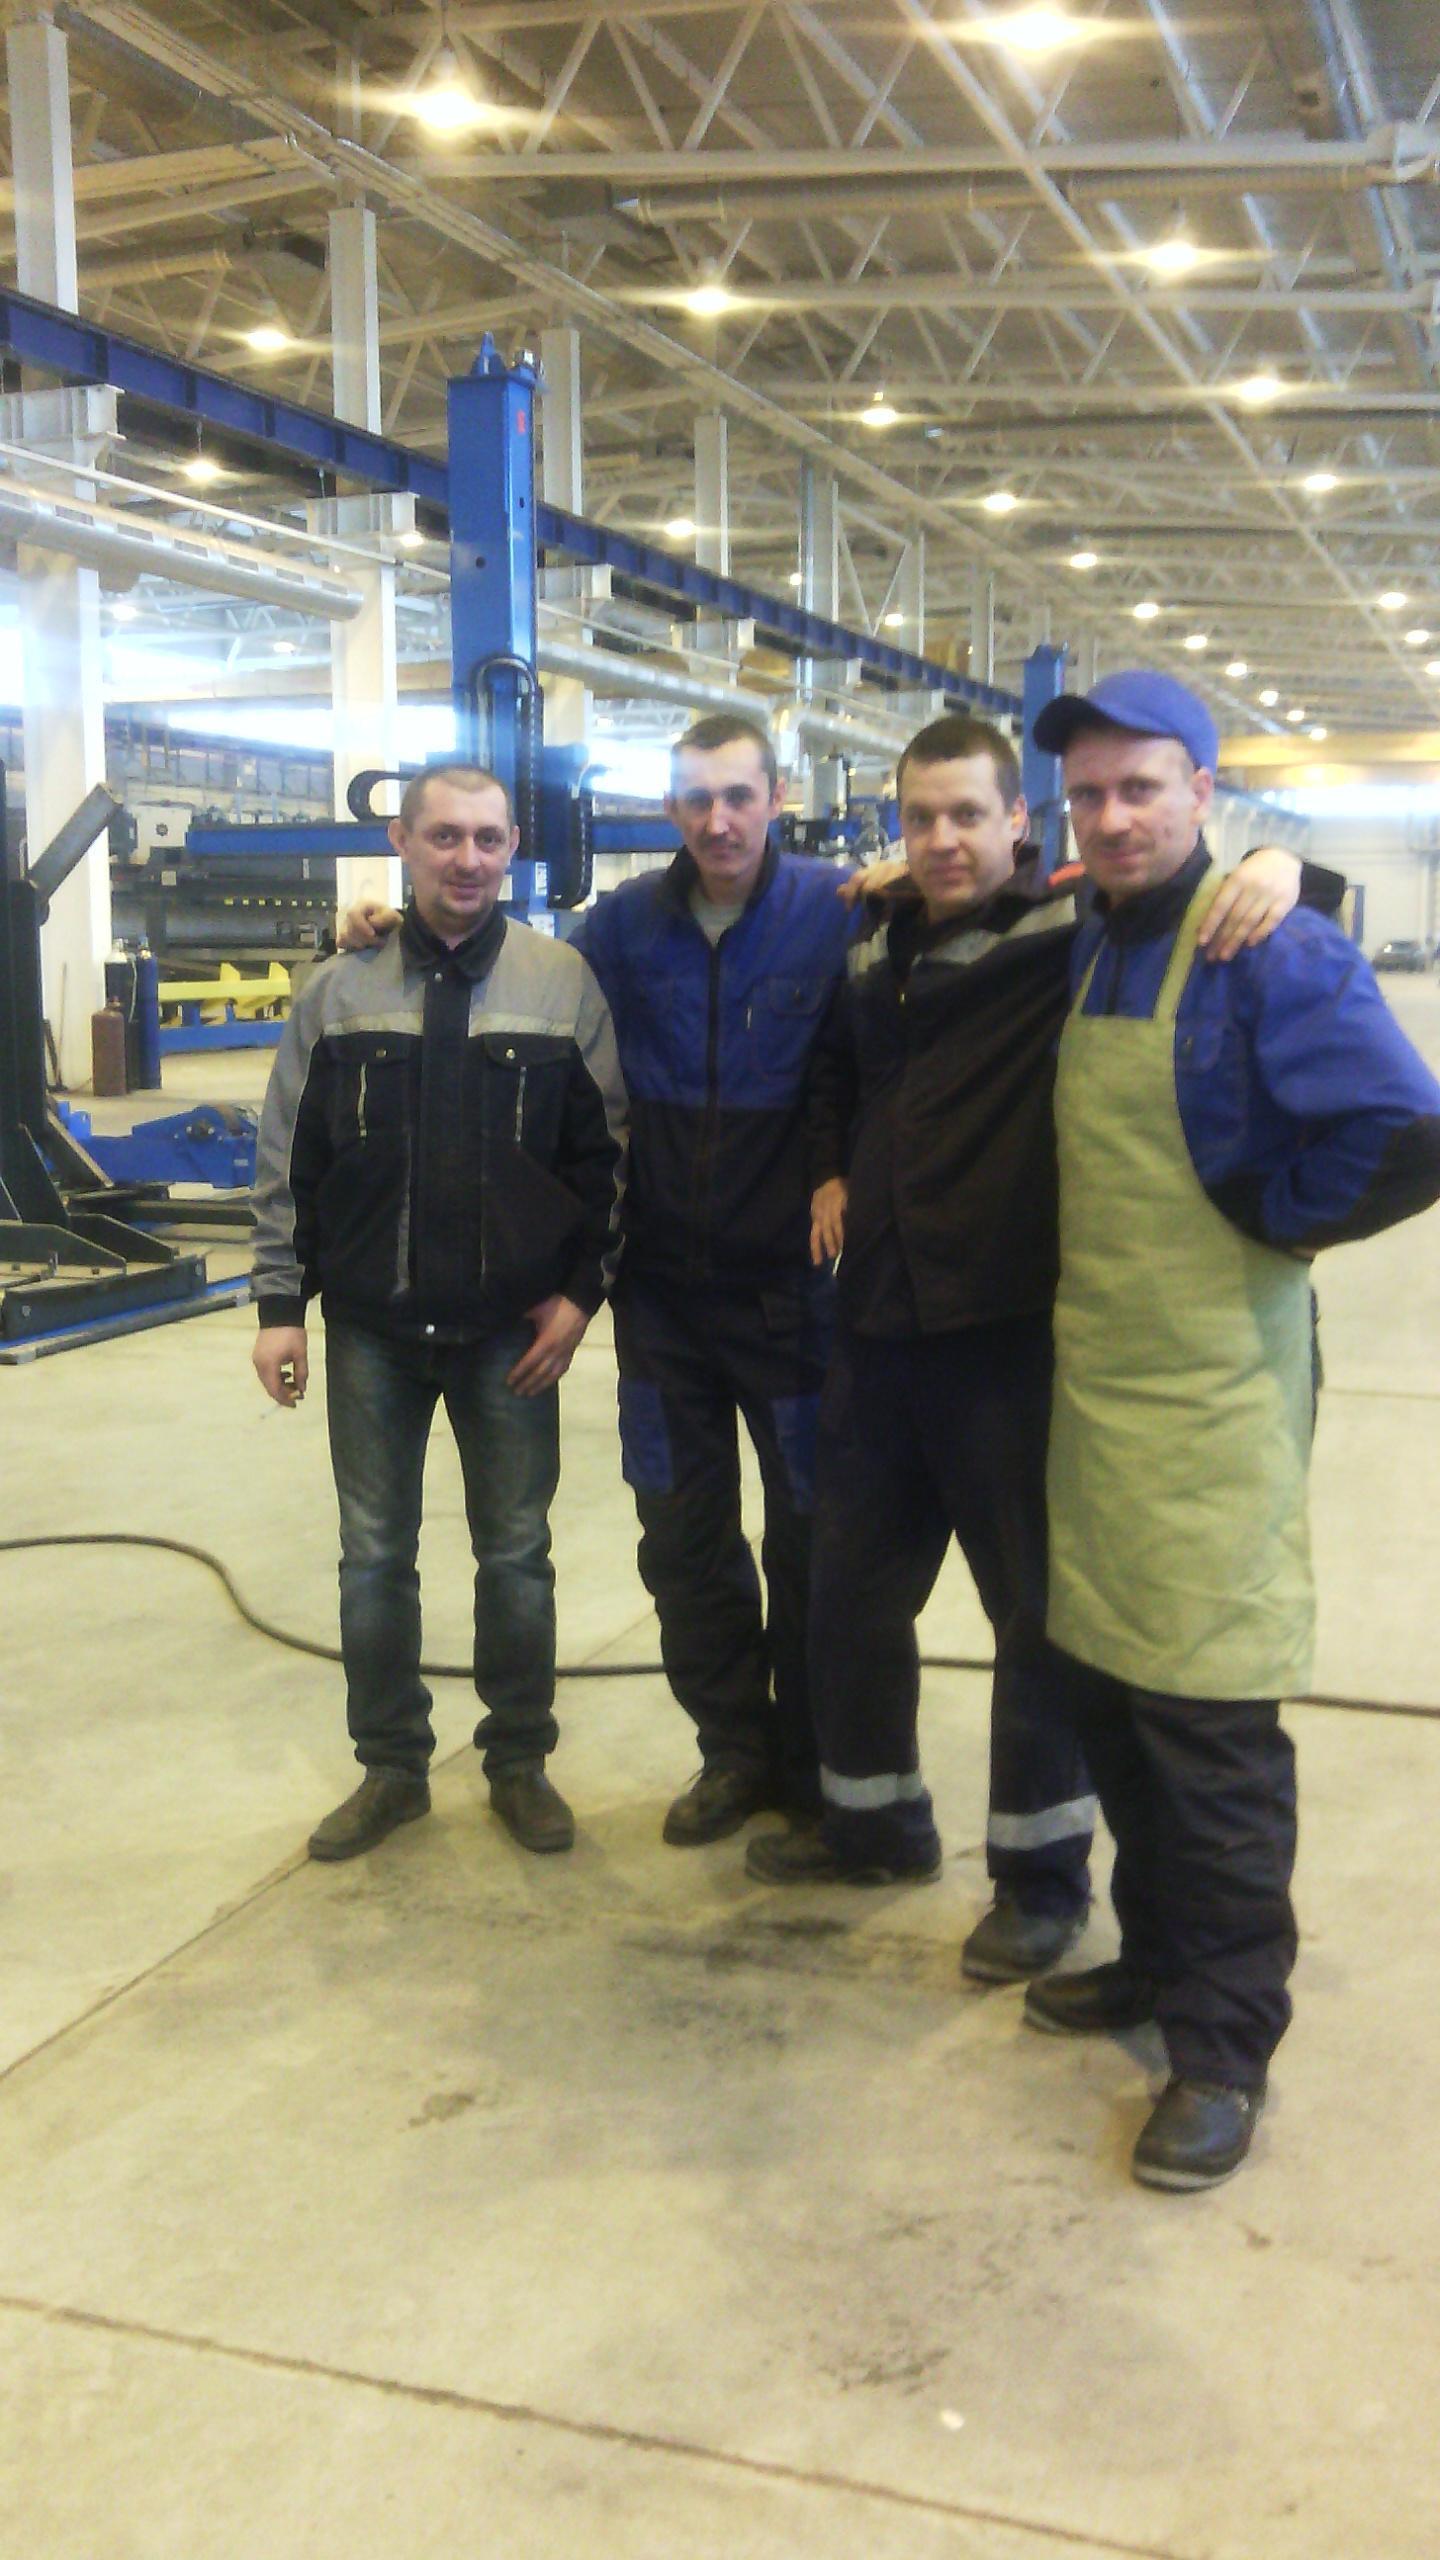 user927, shurabelyj, 30, Оренбург